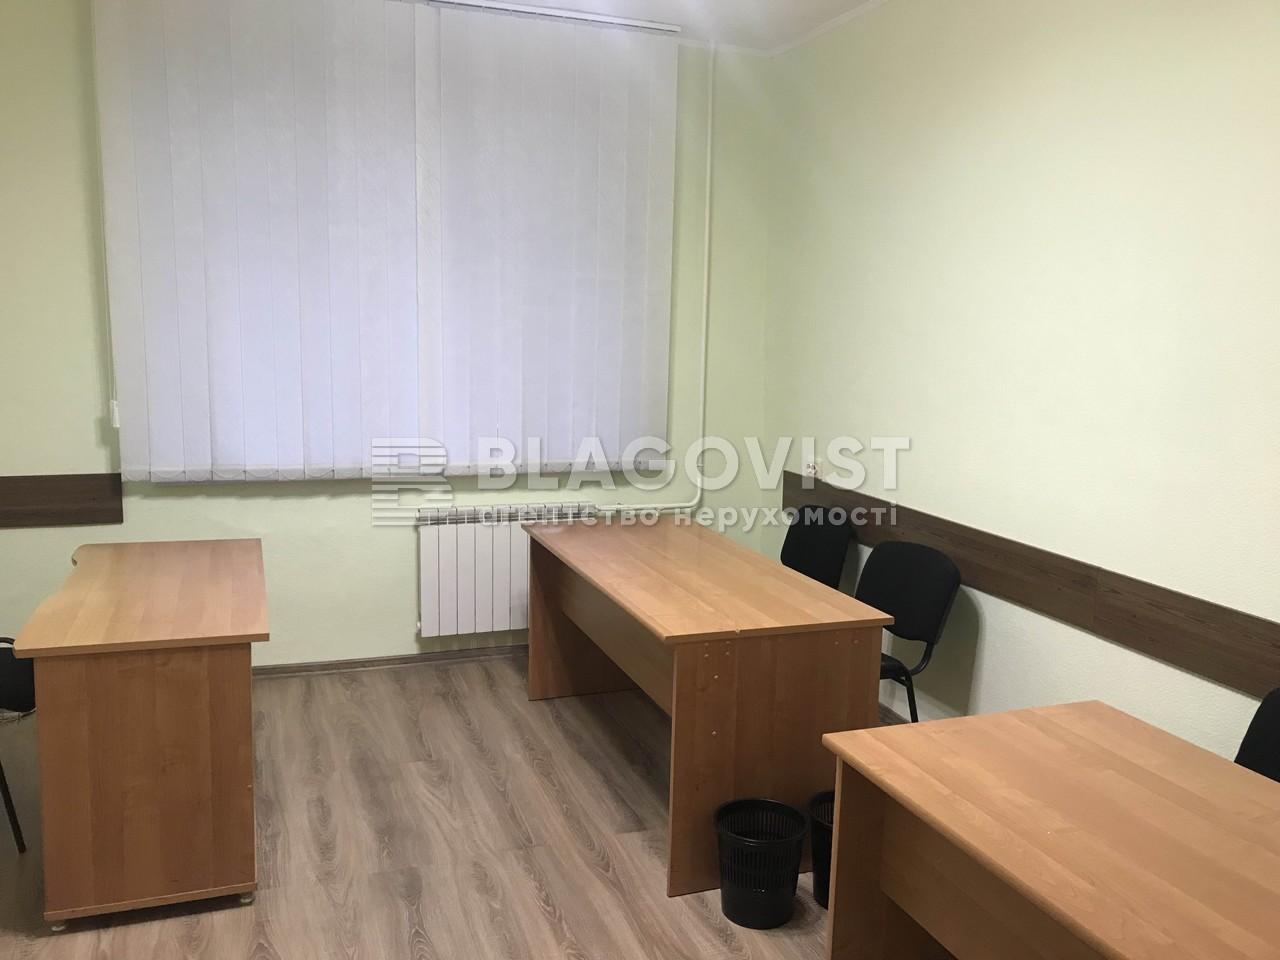 Офис, Z-261276, Шелковичная, Киев - Фото 4